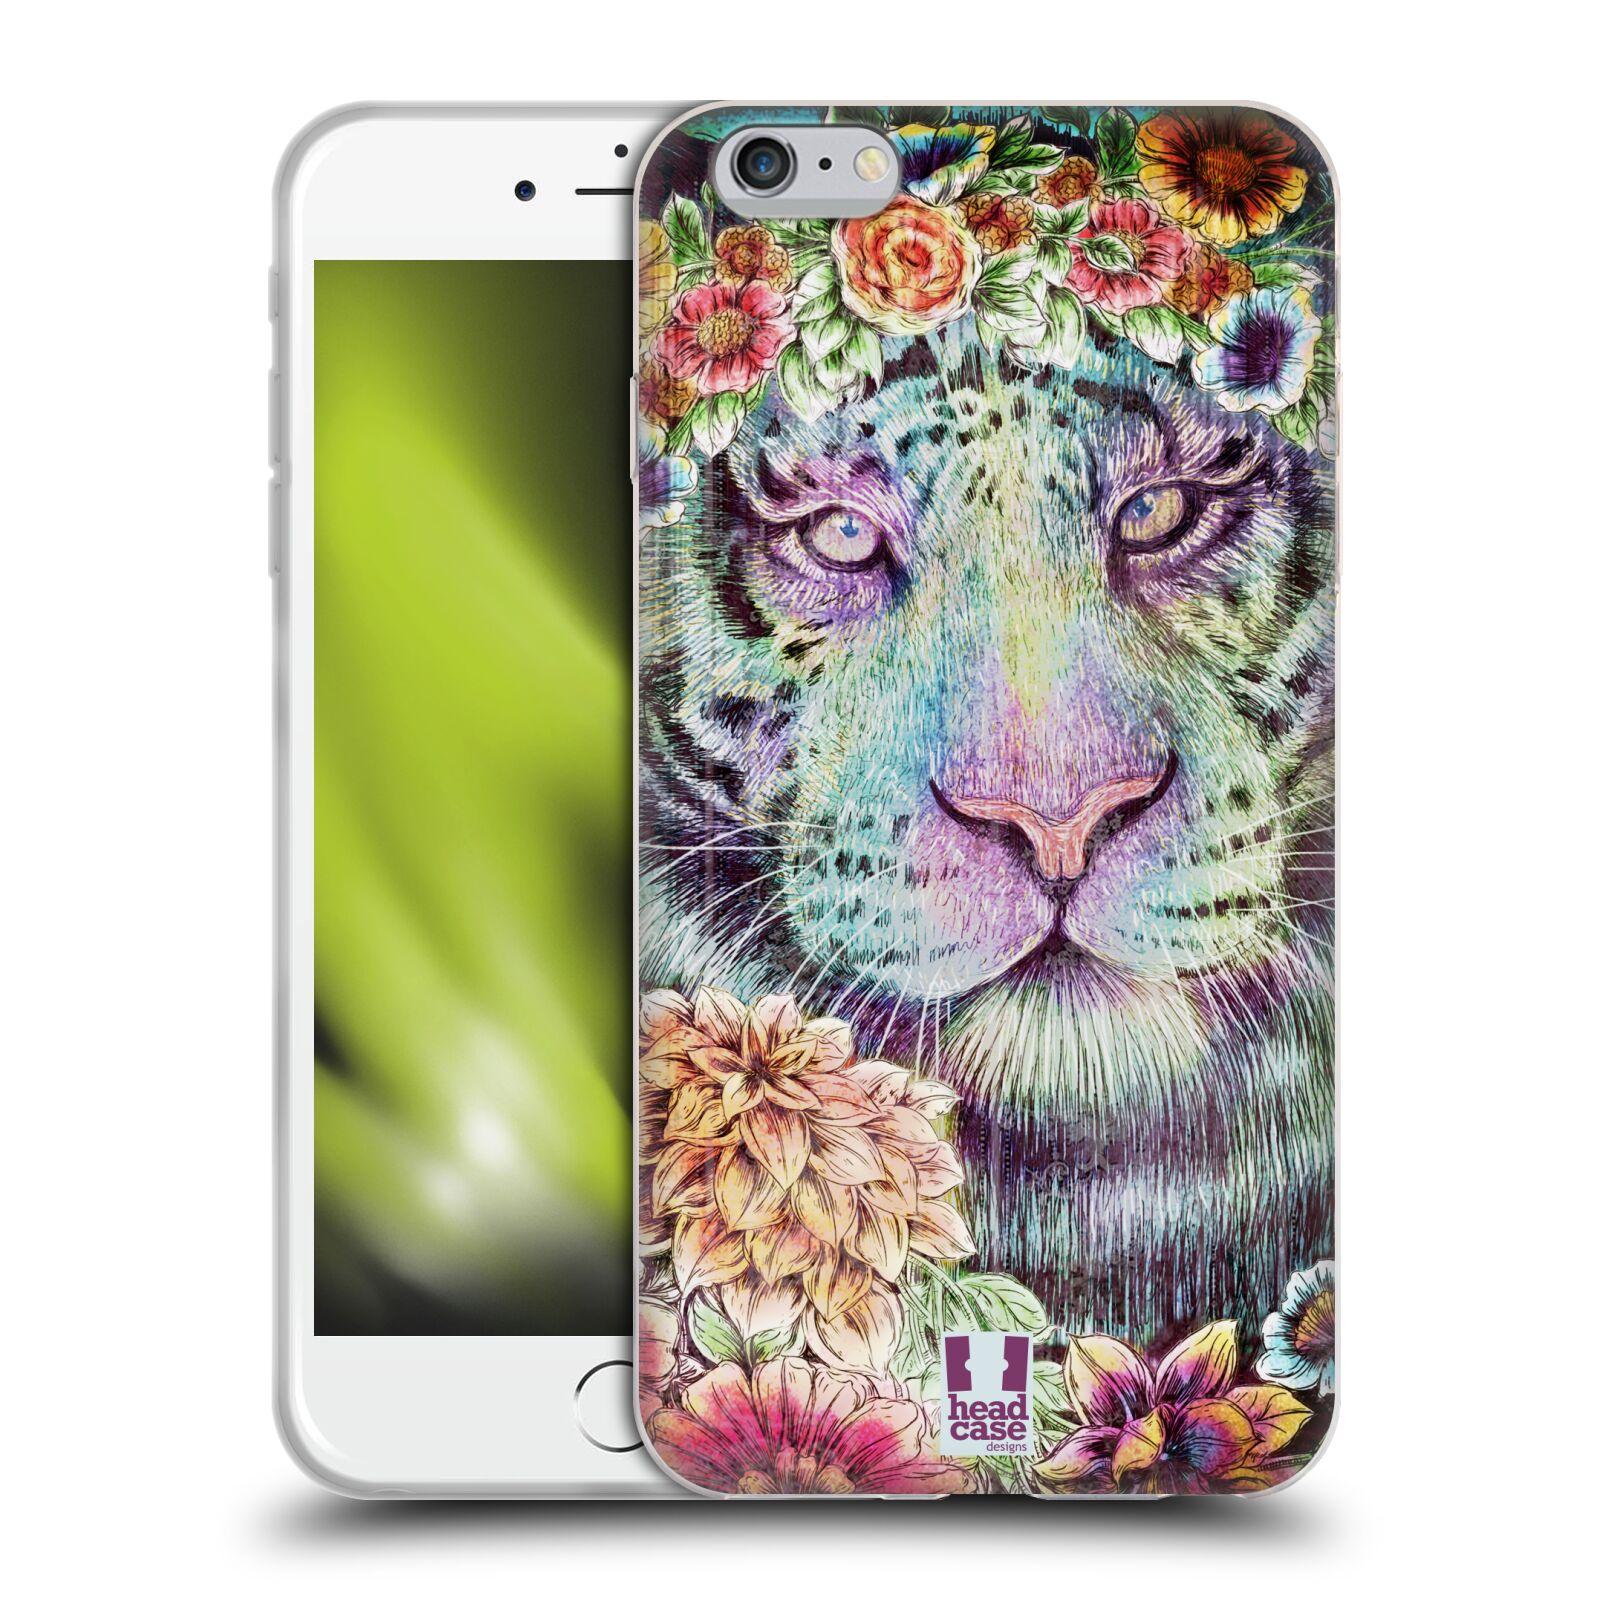 HEAD CASE silikonový obal na mobil Apple Iphone 6 PLUS/ 6S PLUS vzor Květinová zvířáta TYGR